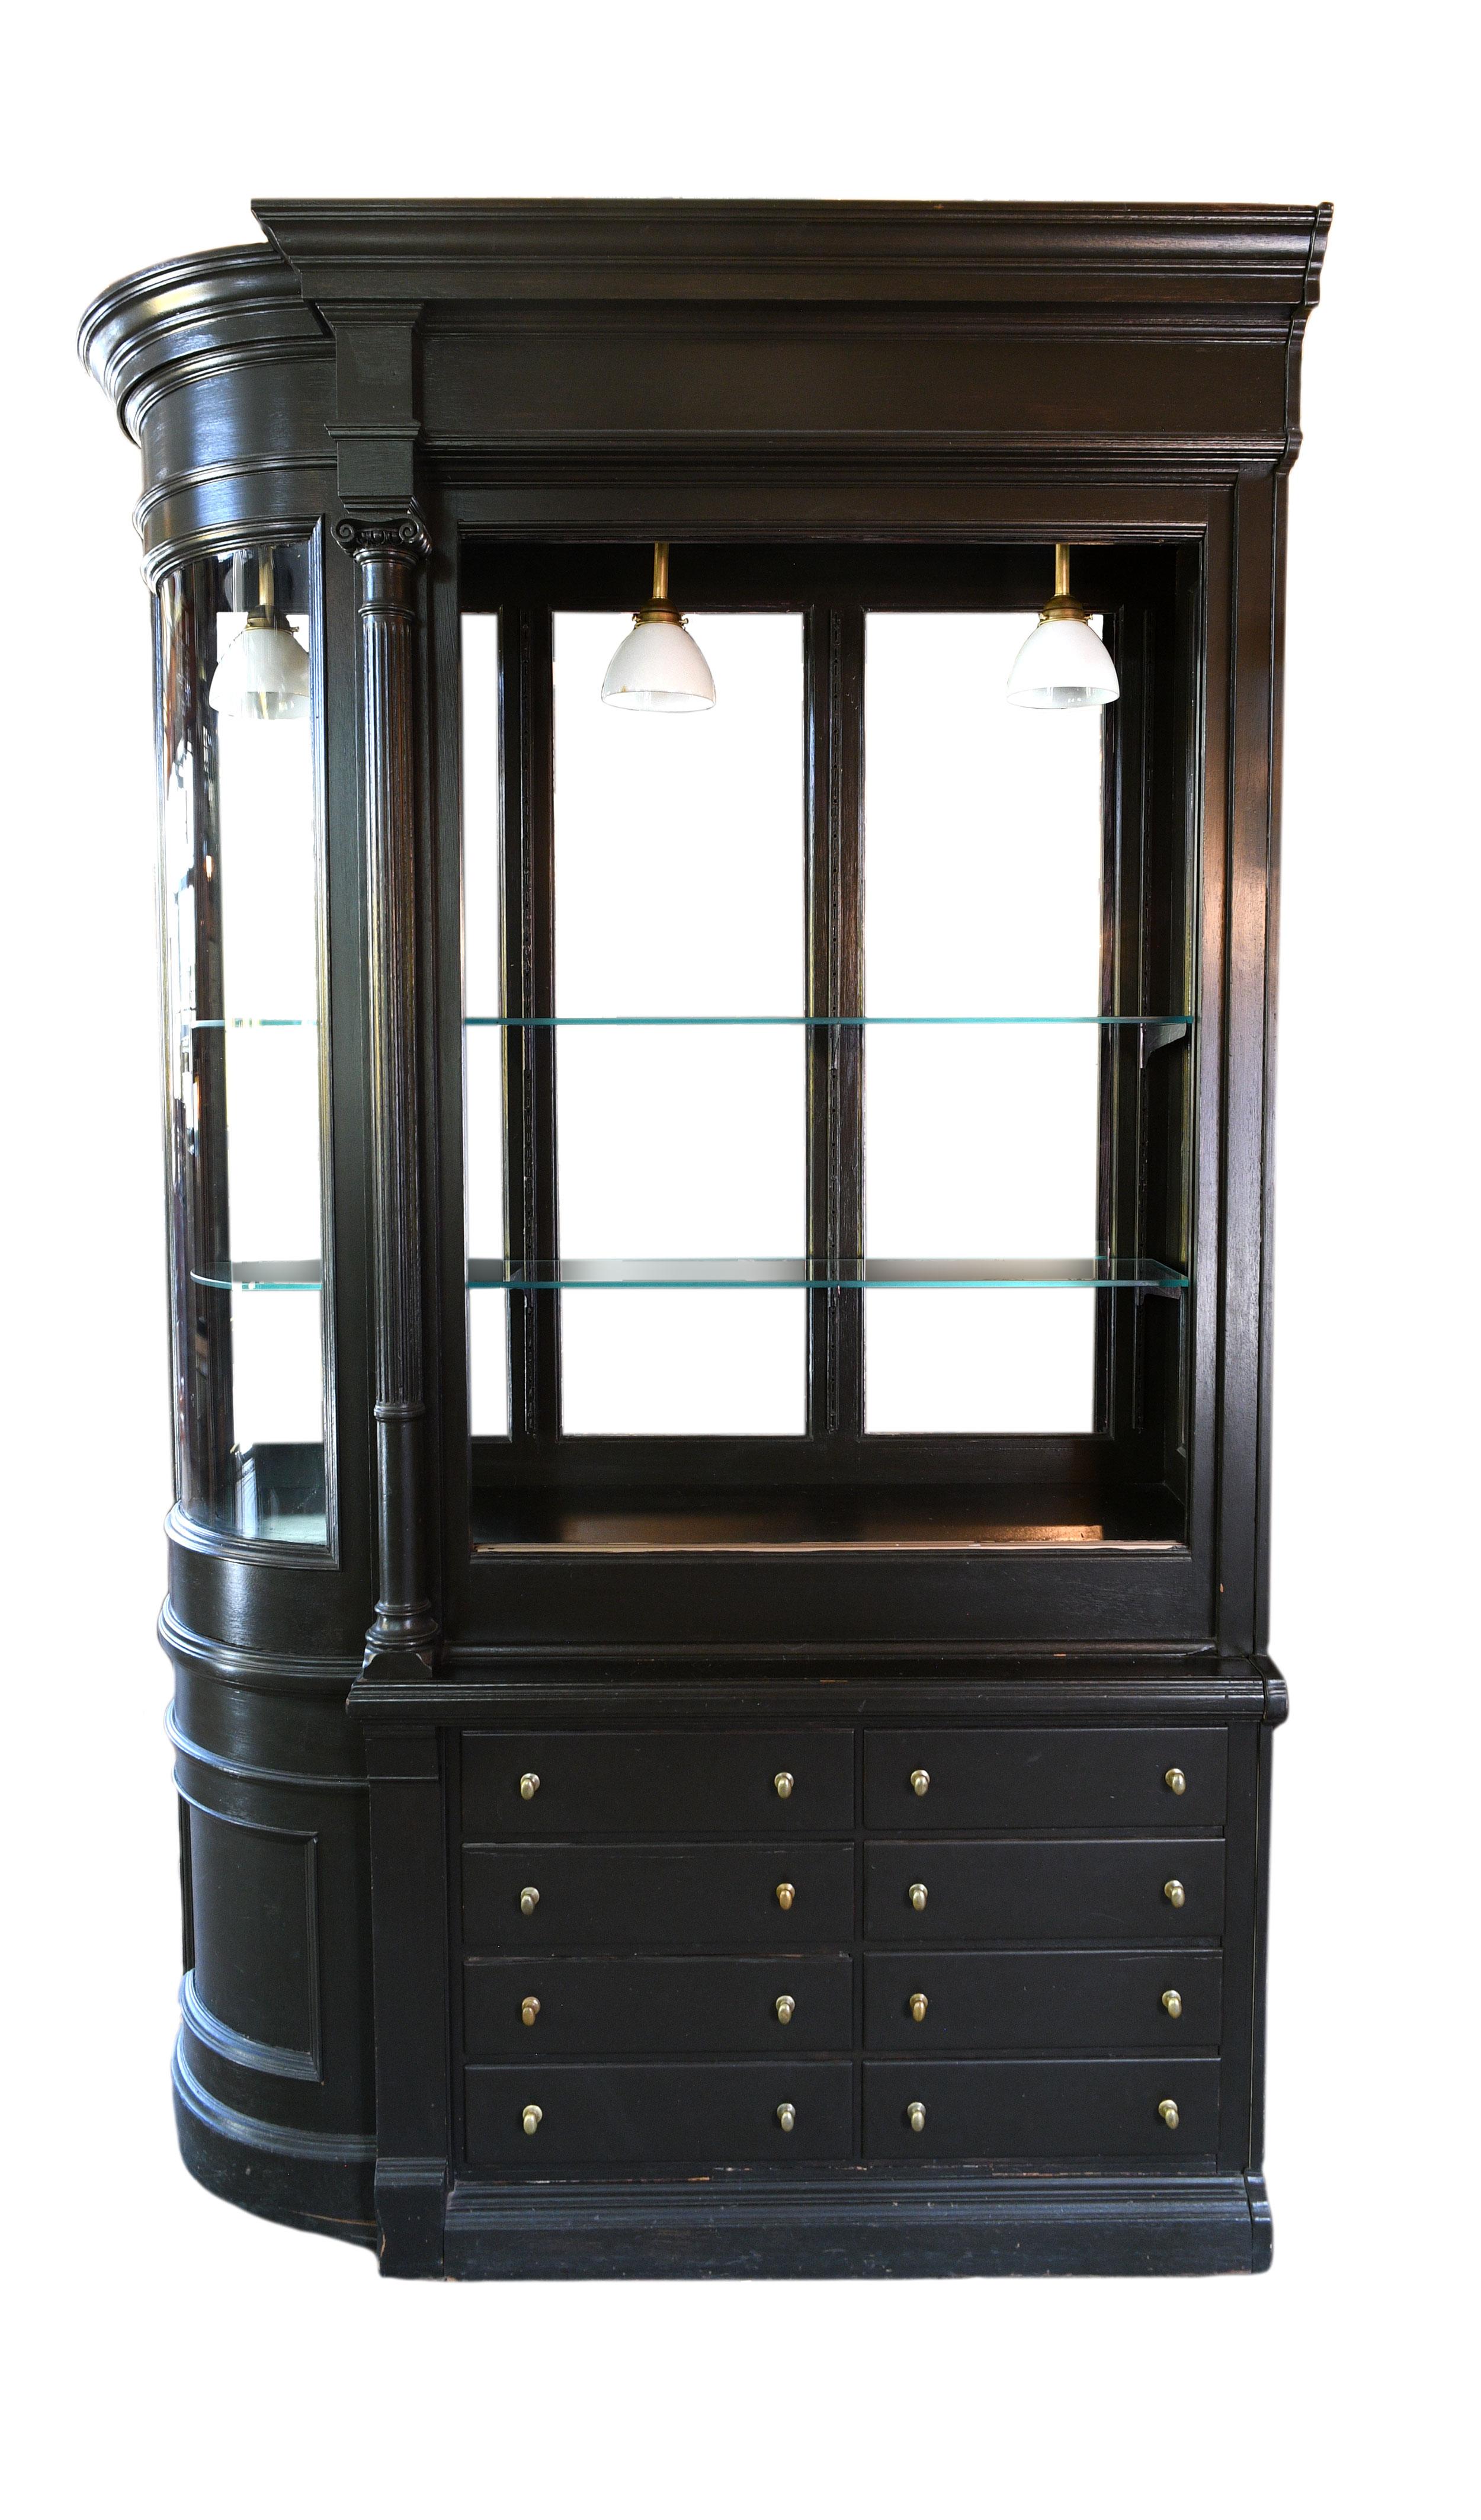 48317-mirrored-cabinet-6.jpg